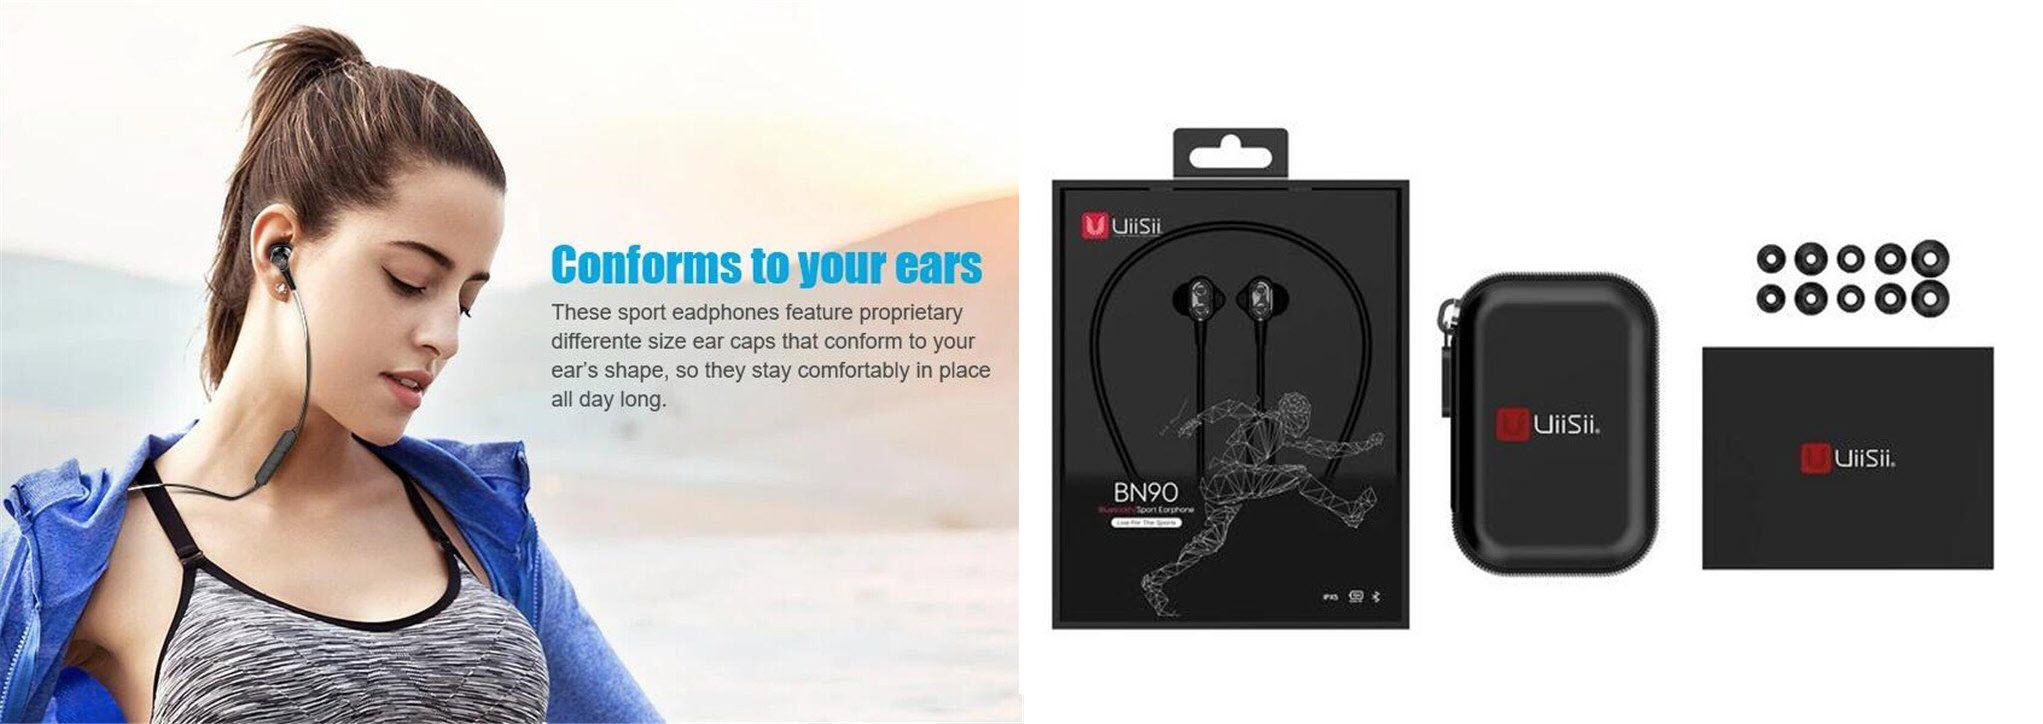 Uiisii Bt 260 Wireless Bluetooth Sports Earphones (4)